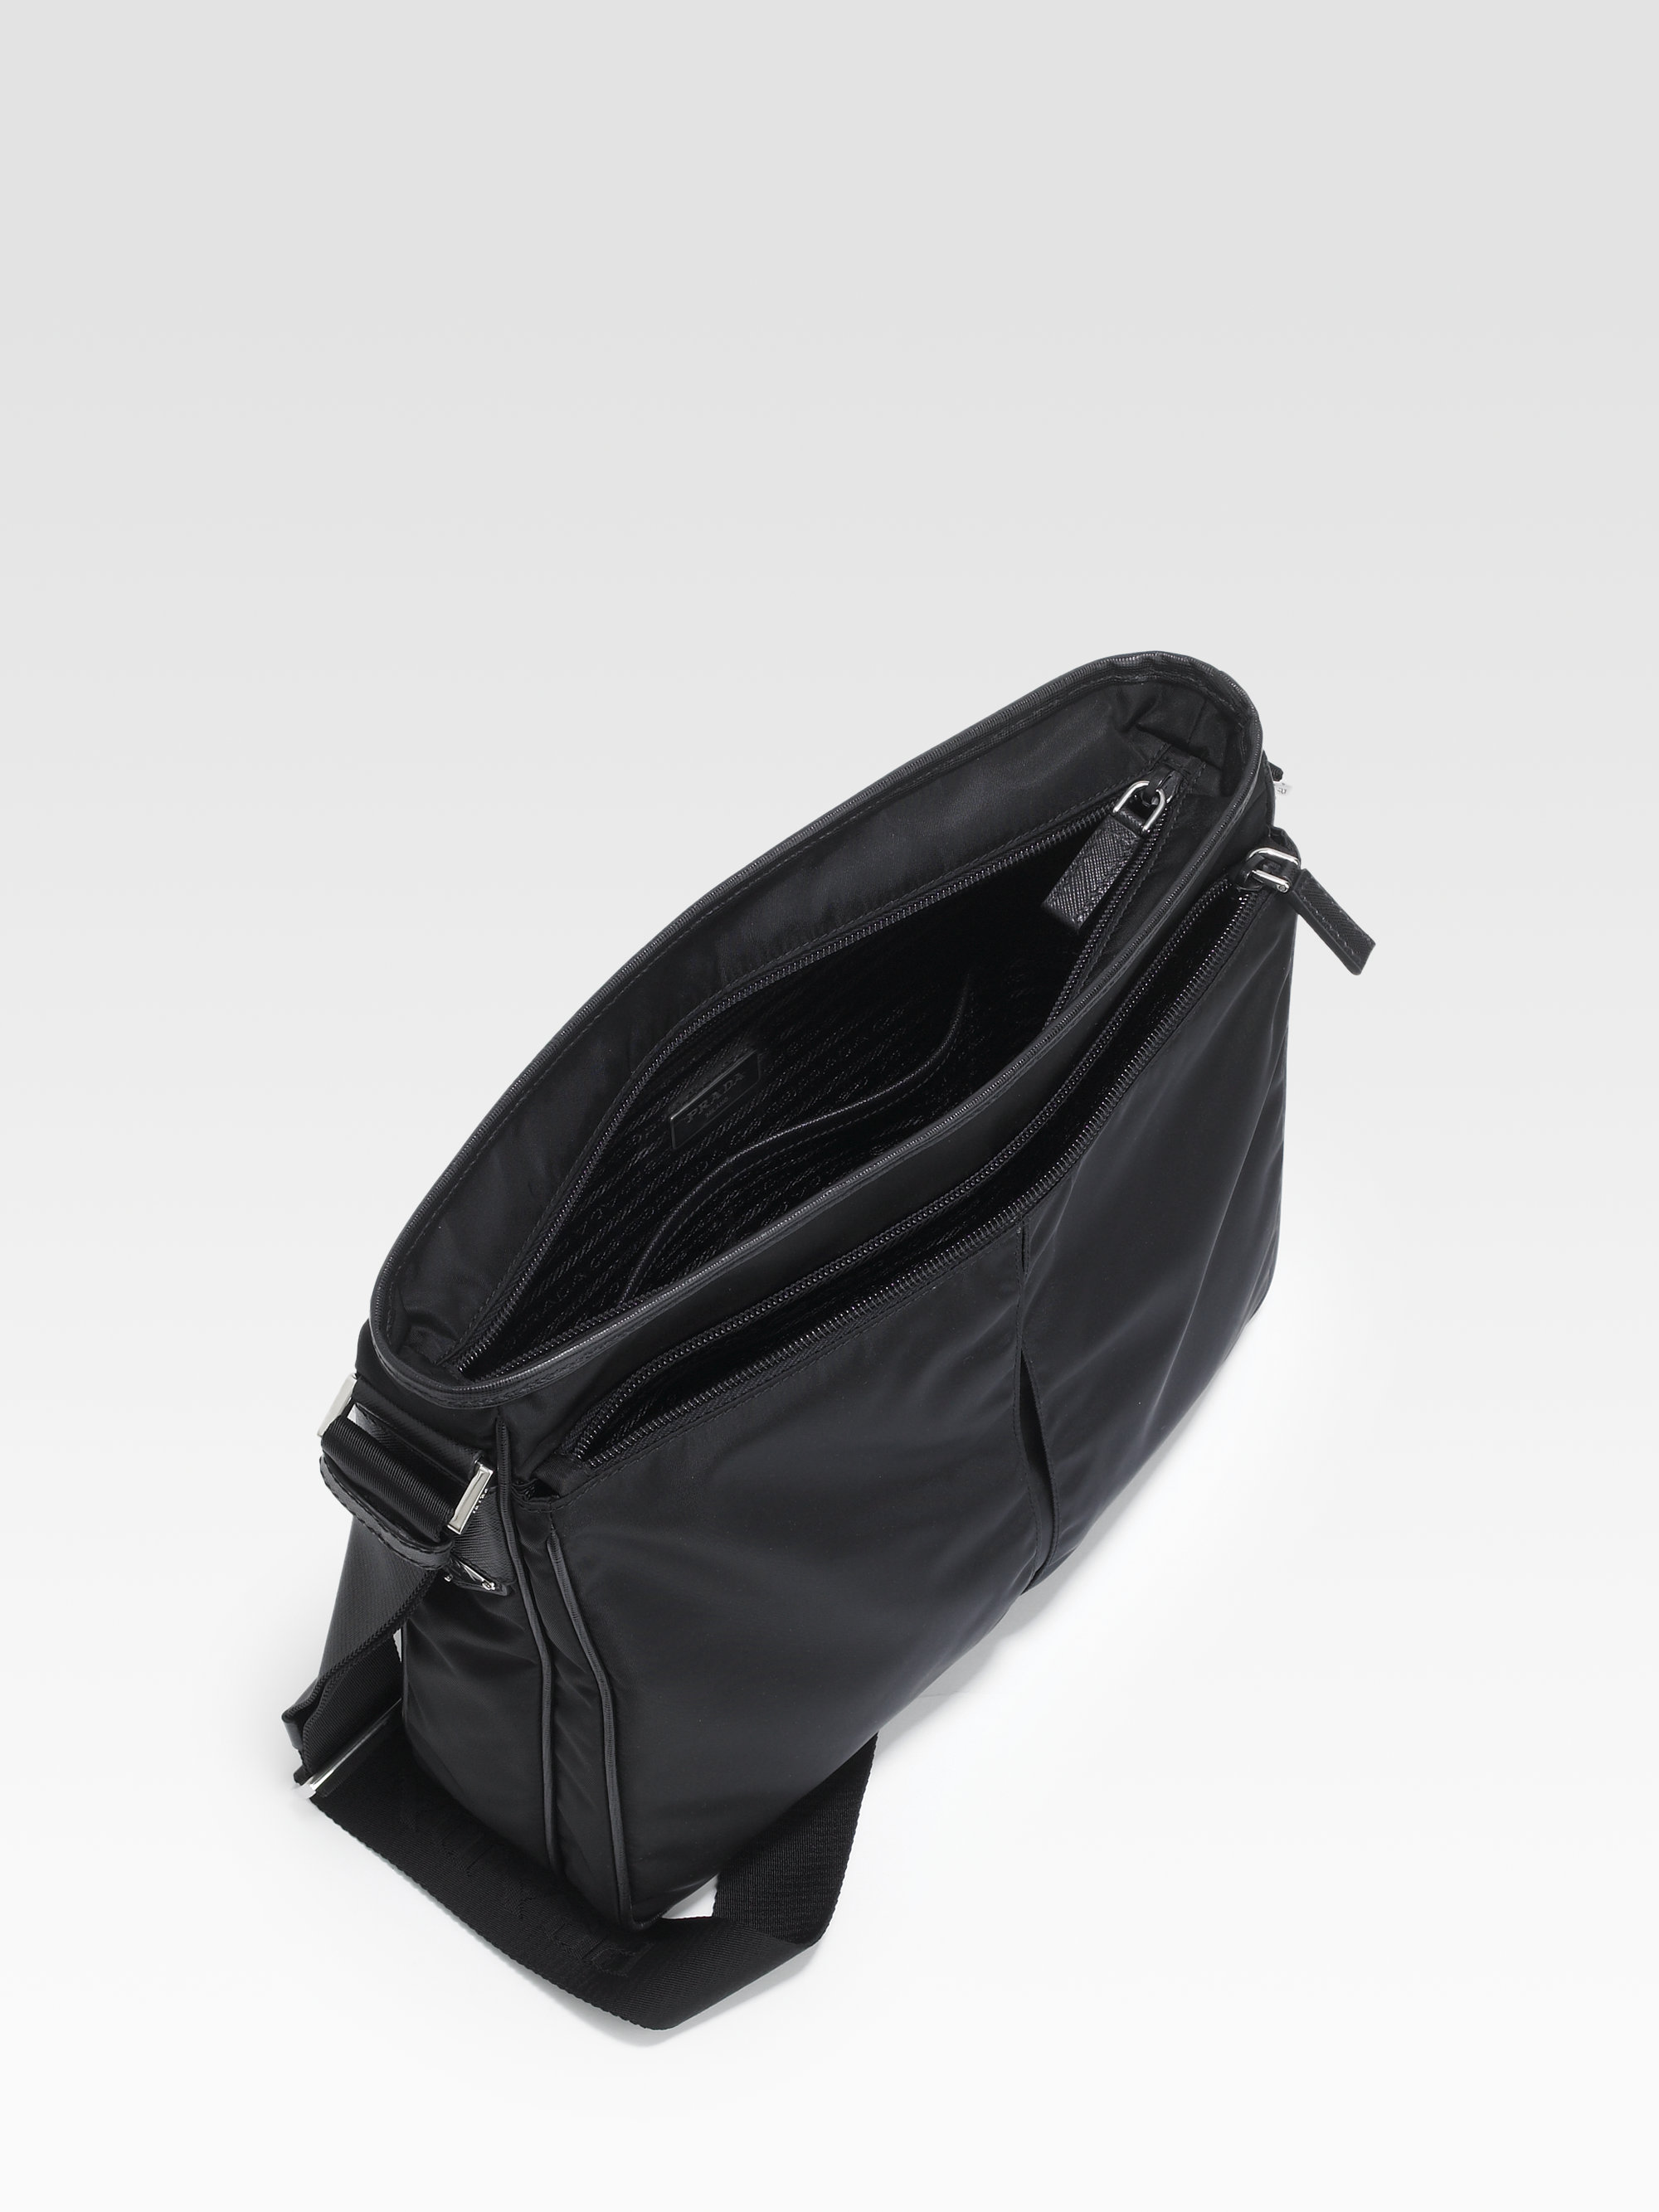 5c70b9c335e discount lyst prada nylon large crossbody bag in black for men a594a 3a848